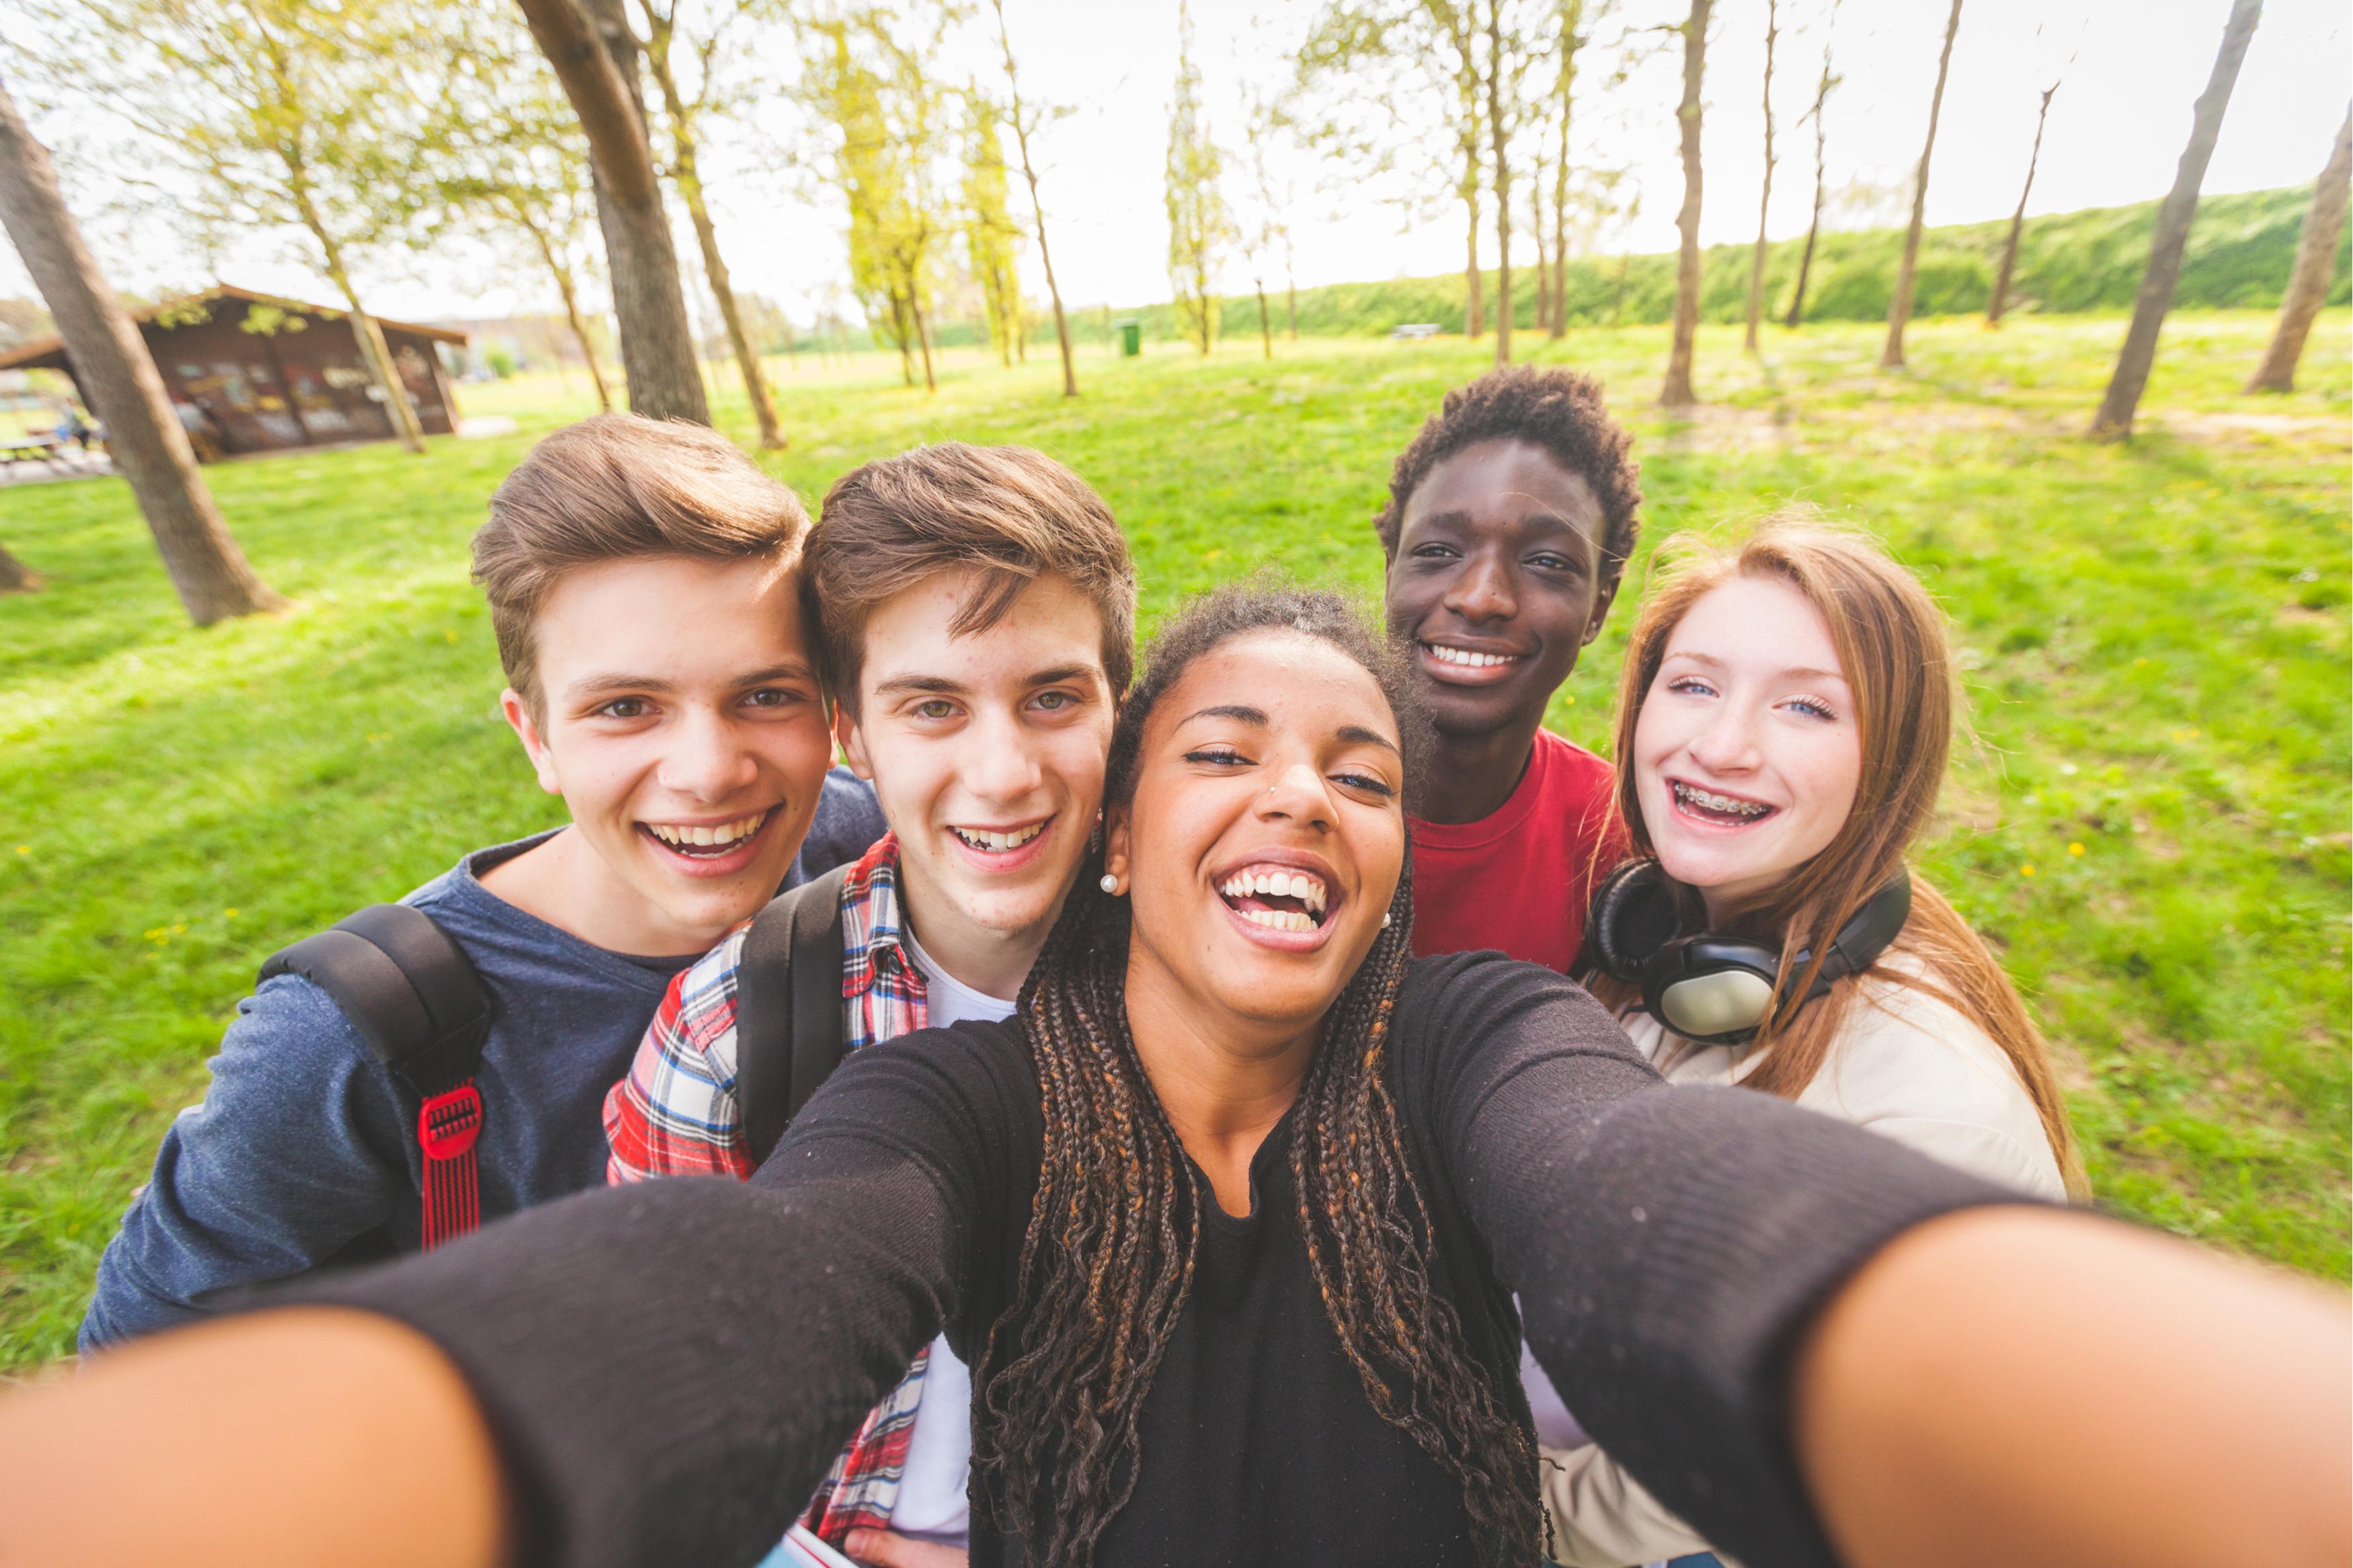 Network teen music teenagers photo